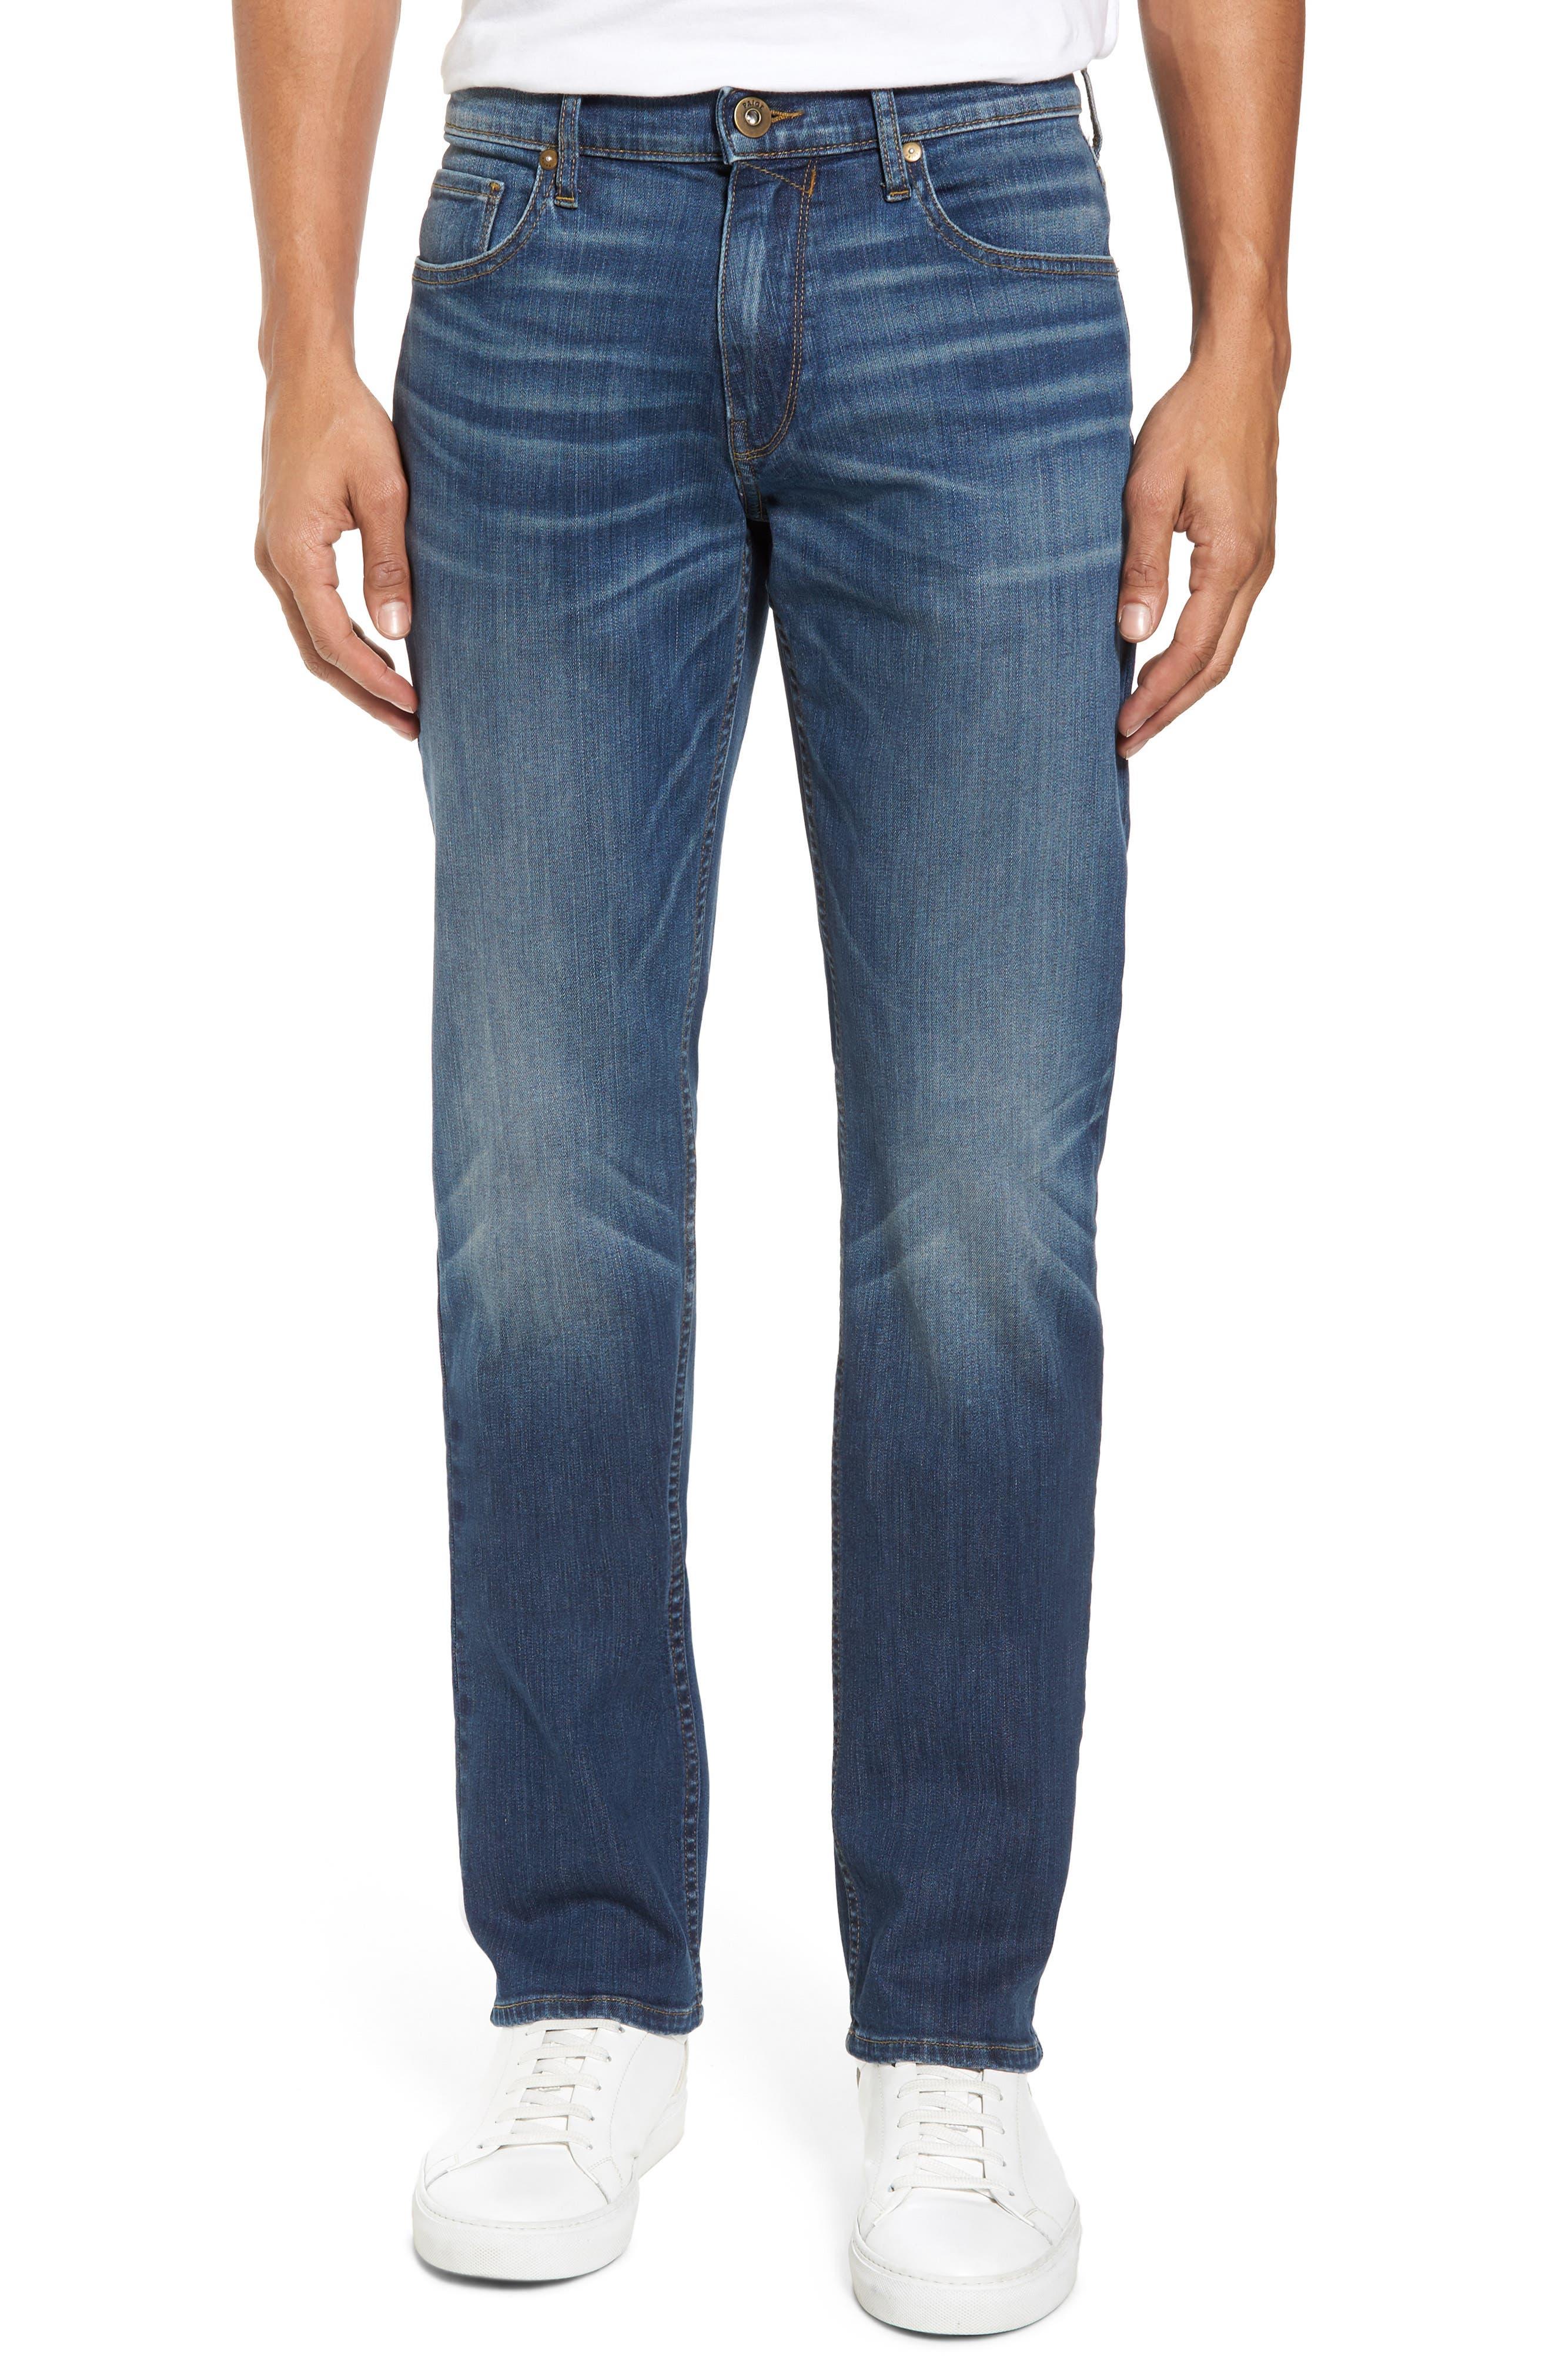 Legacy - Normandie Straight Leg Jeans,                             Main thumbnail 1, color,                             Harlan